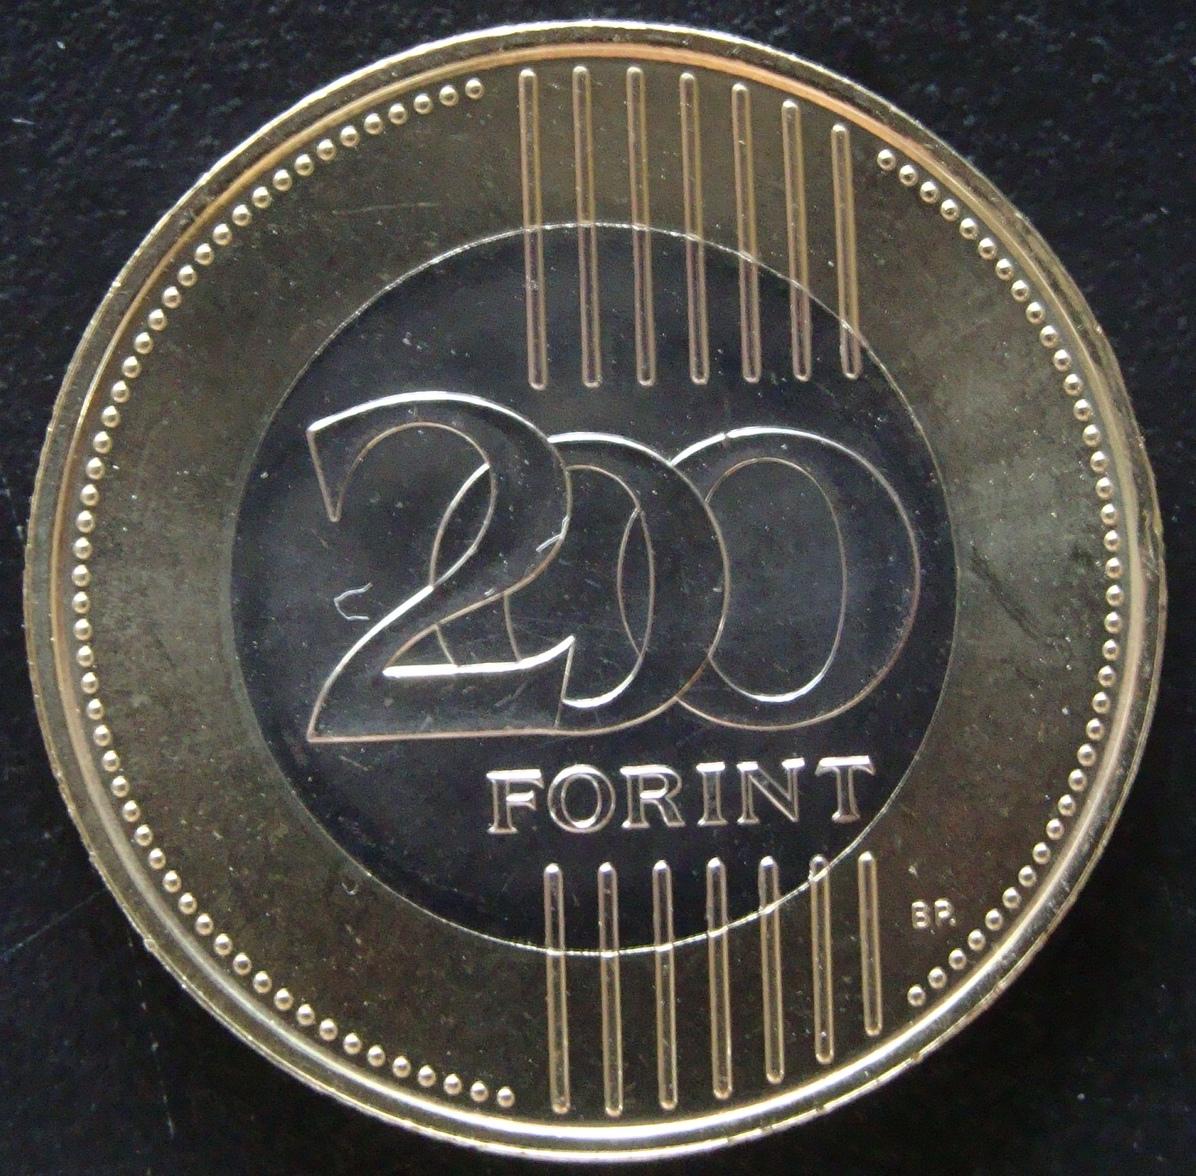 200 Forint. Hungría (2012) HUN_200_Forint_2012_rev